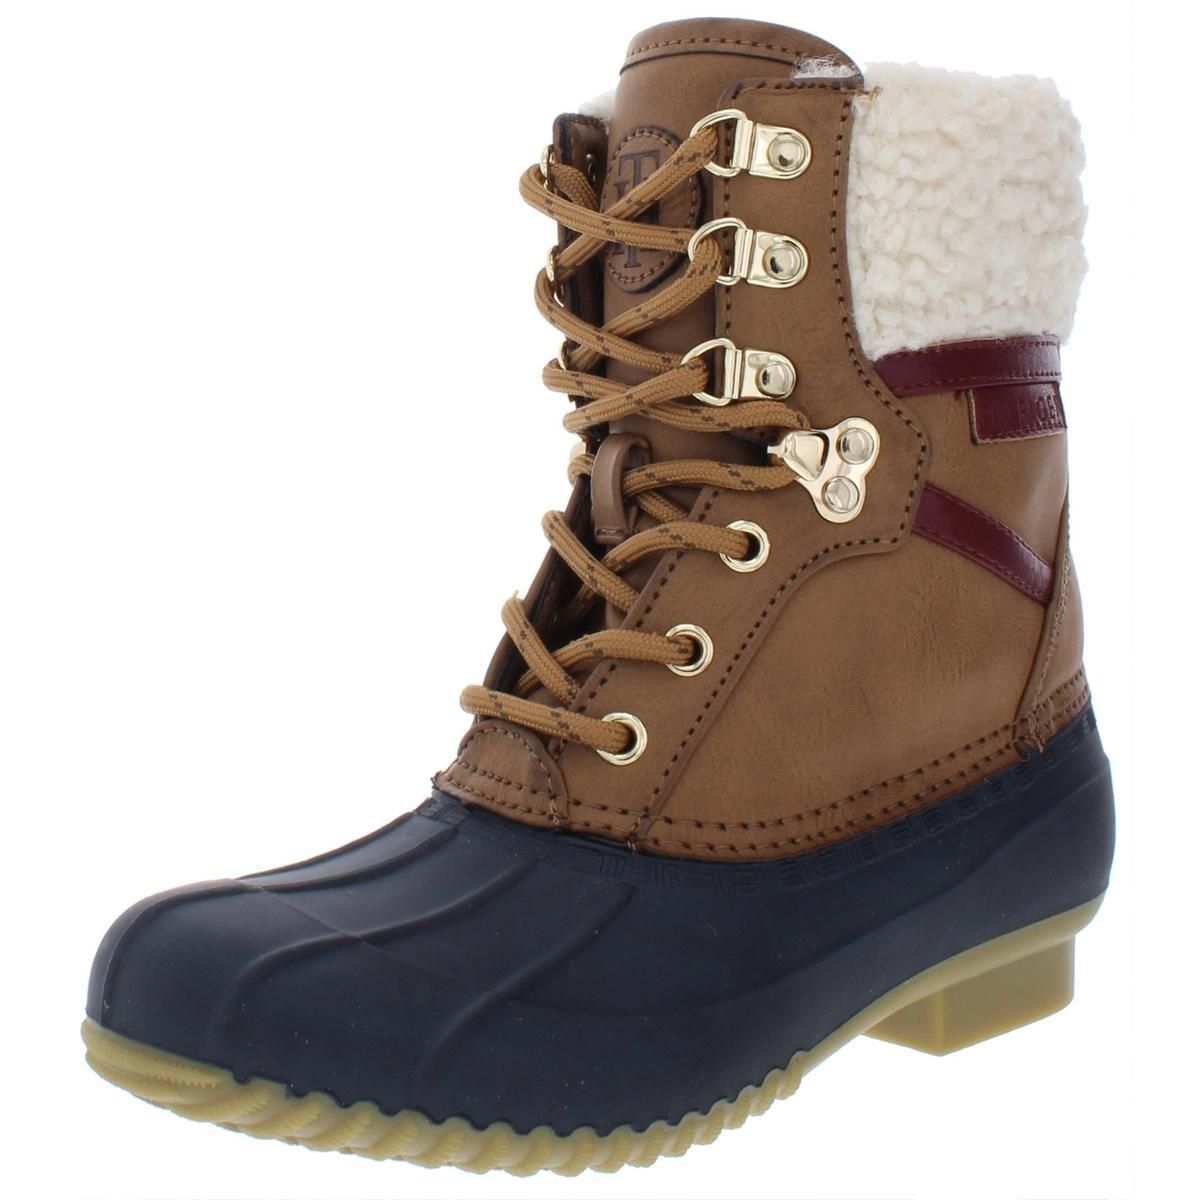 Tommy Hilfiger Womens Rainboots Brown Size 11 Medium (B,M)